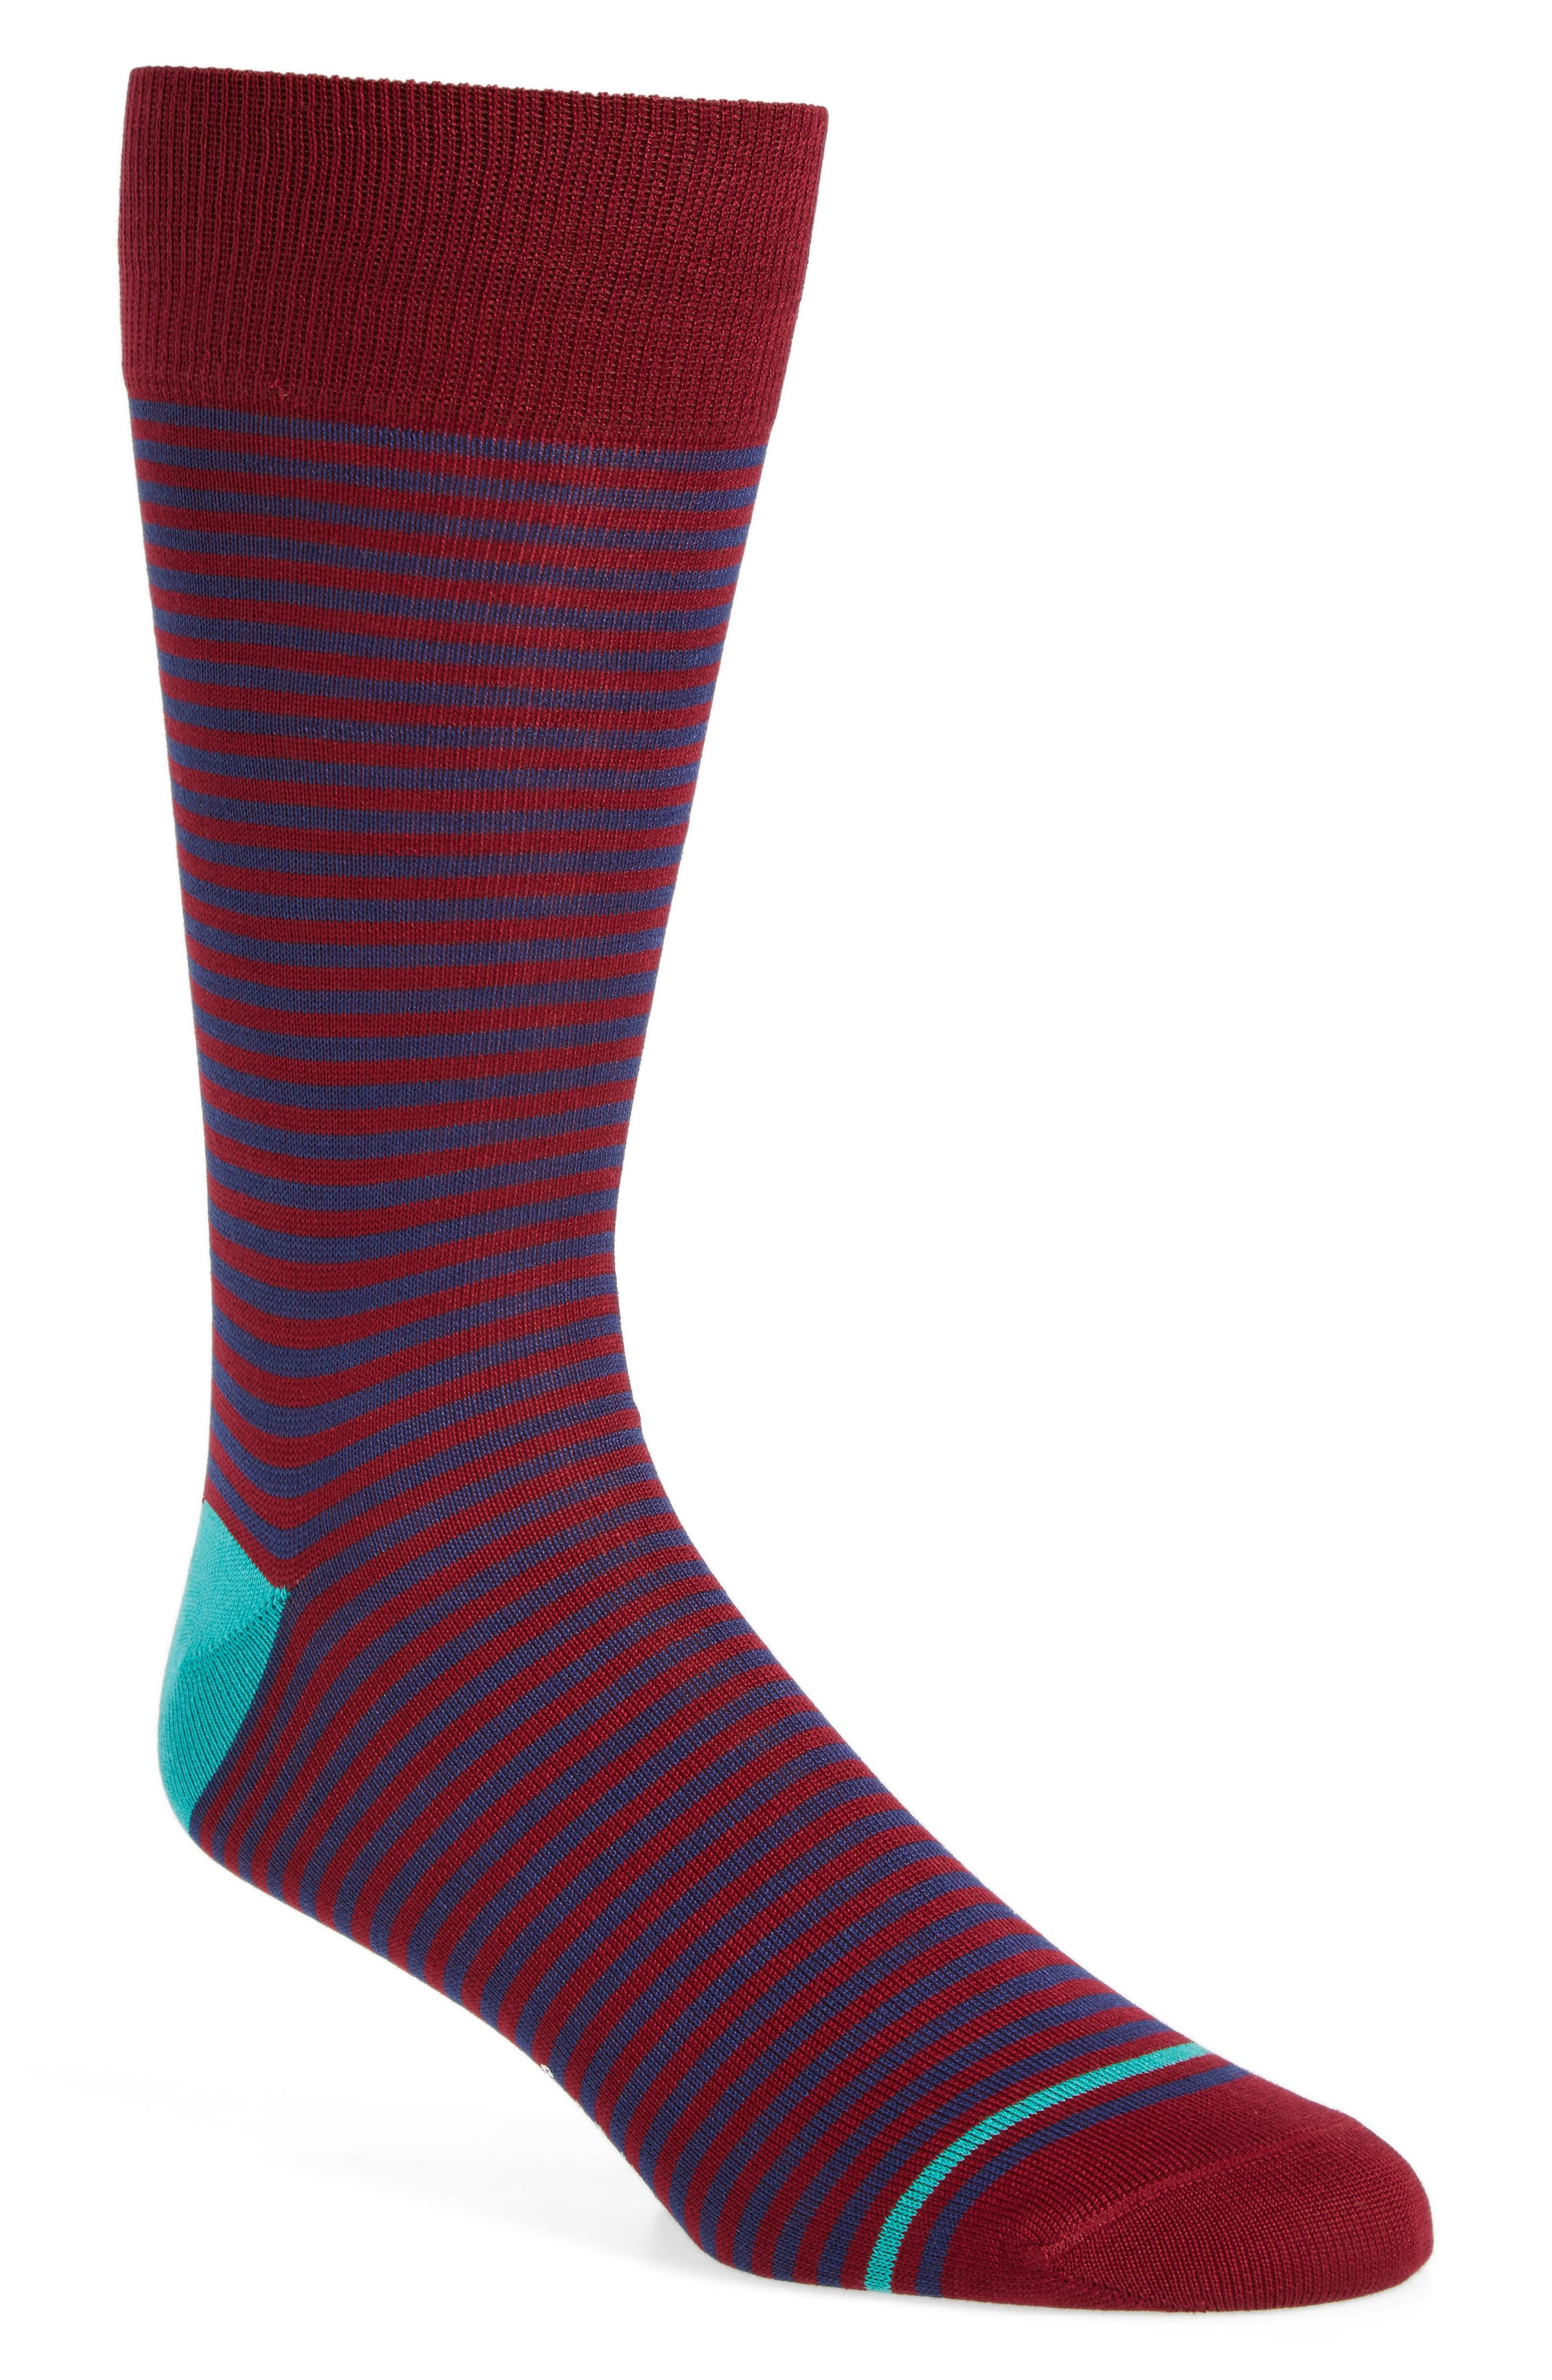 Alternate Image 1 Selected - Paul Smith Marsden Stripe Socks